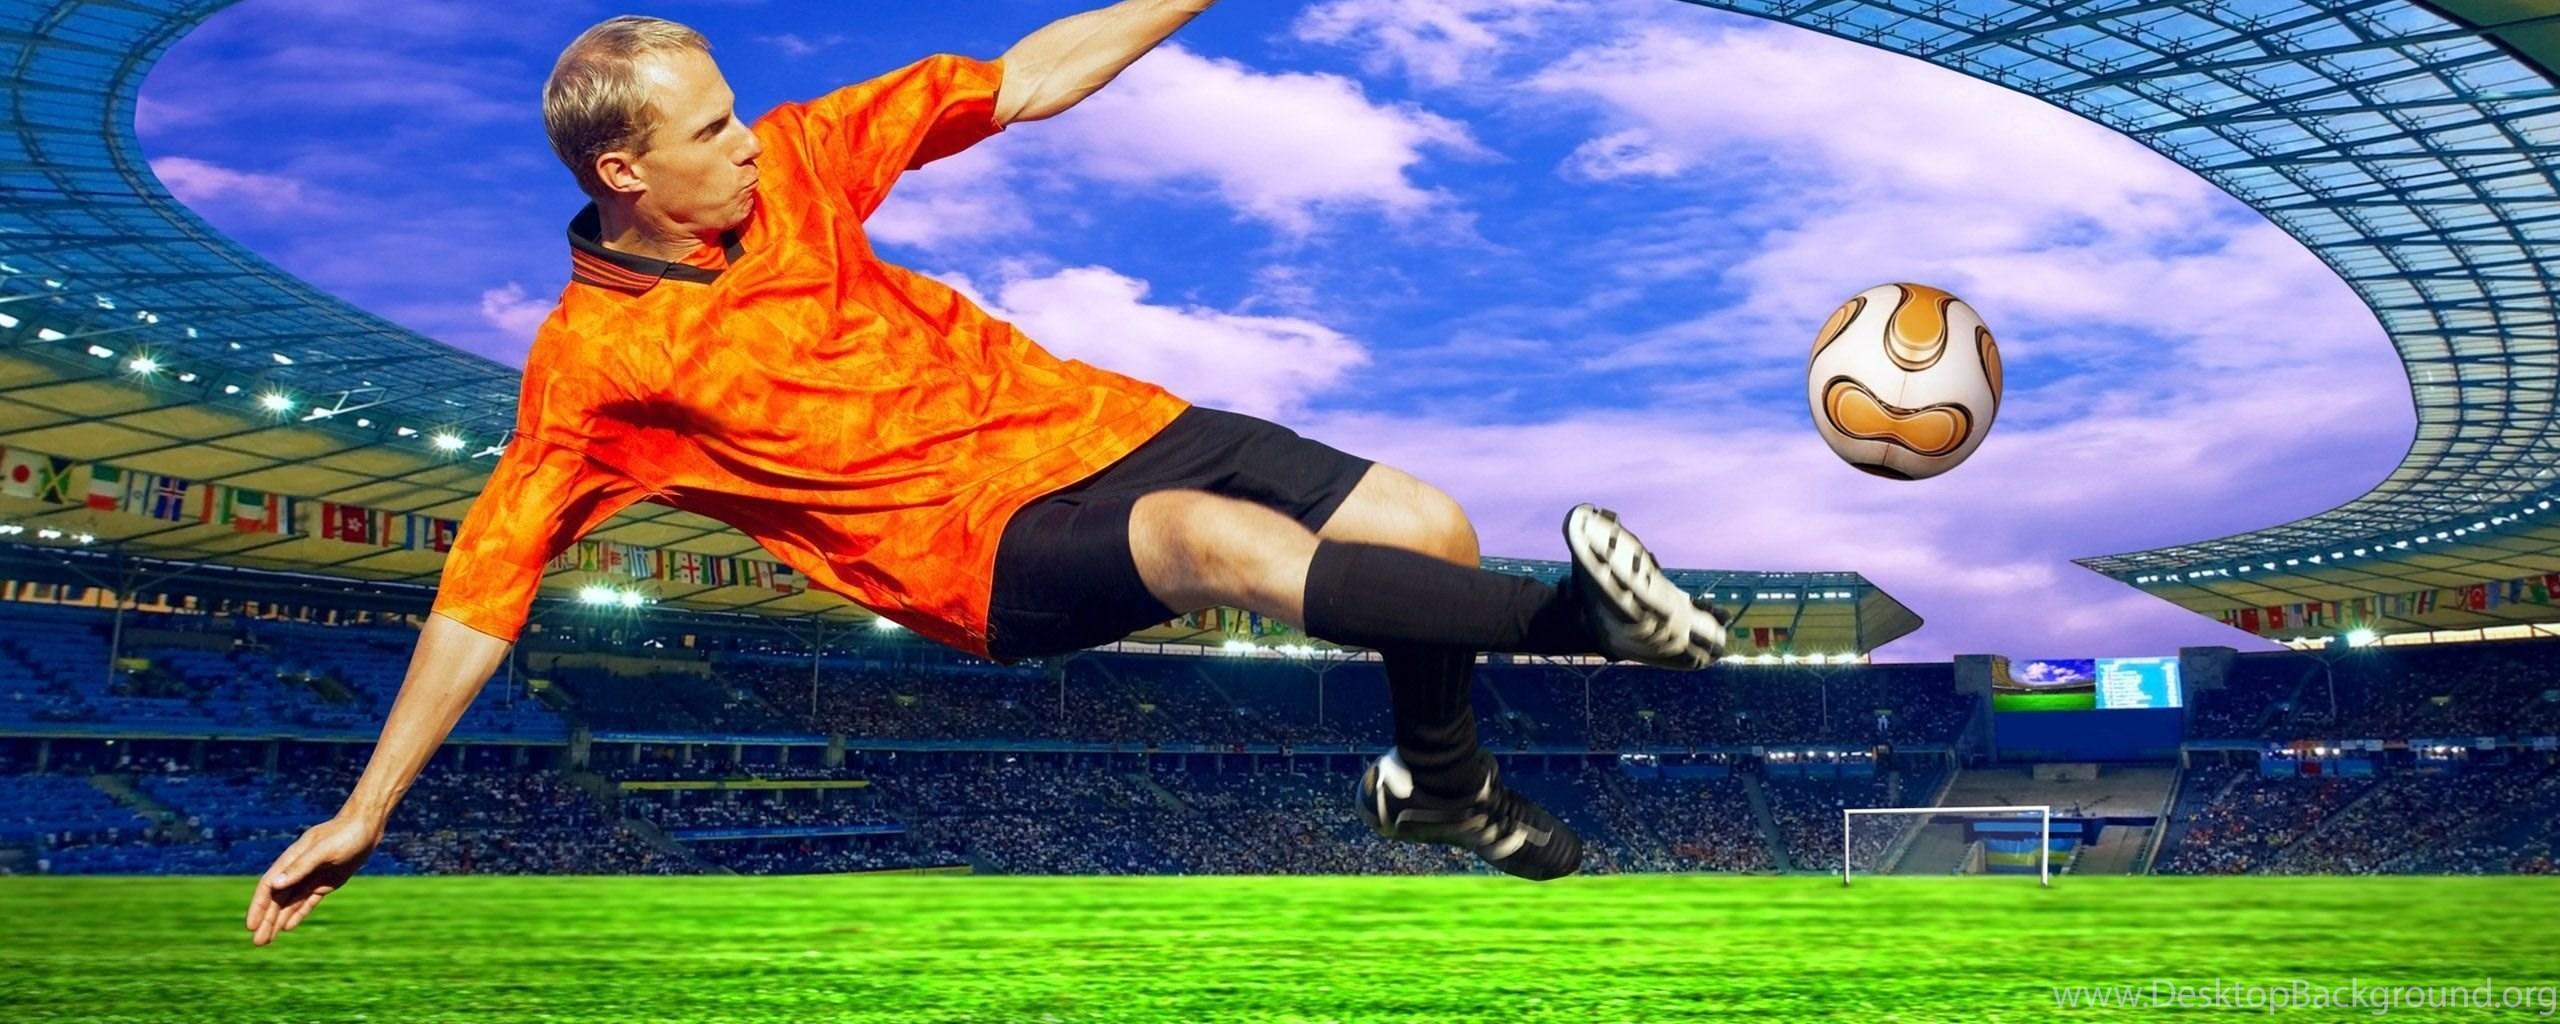 блогспот футбол